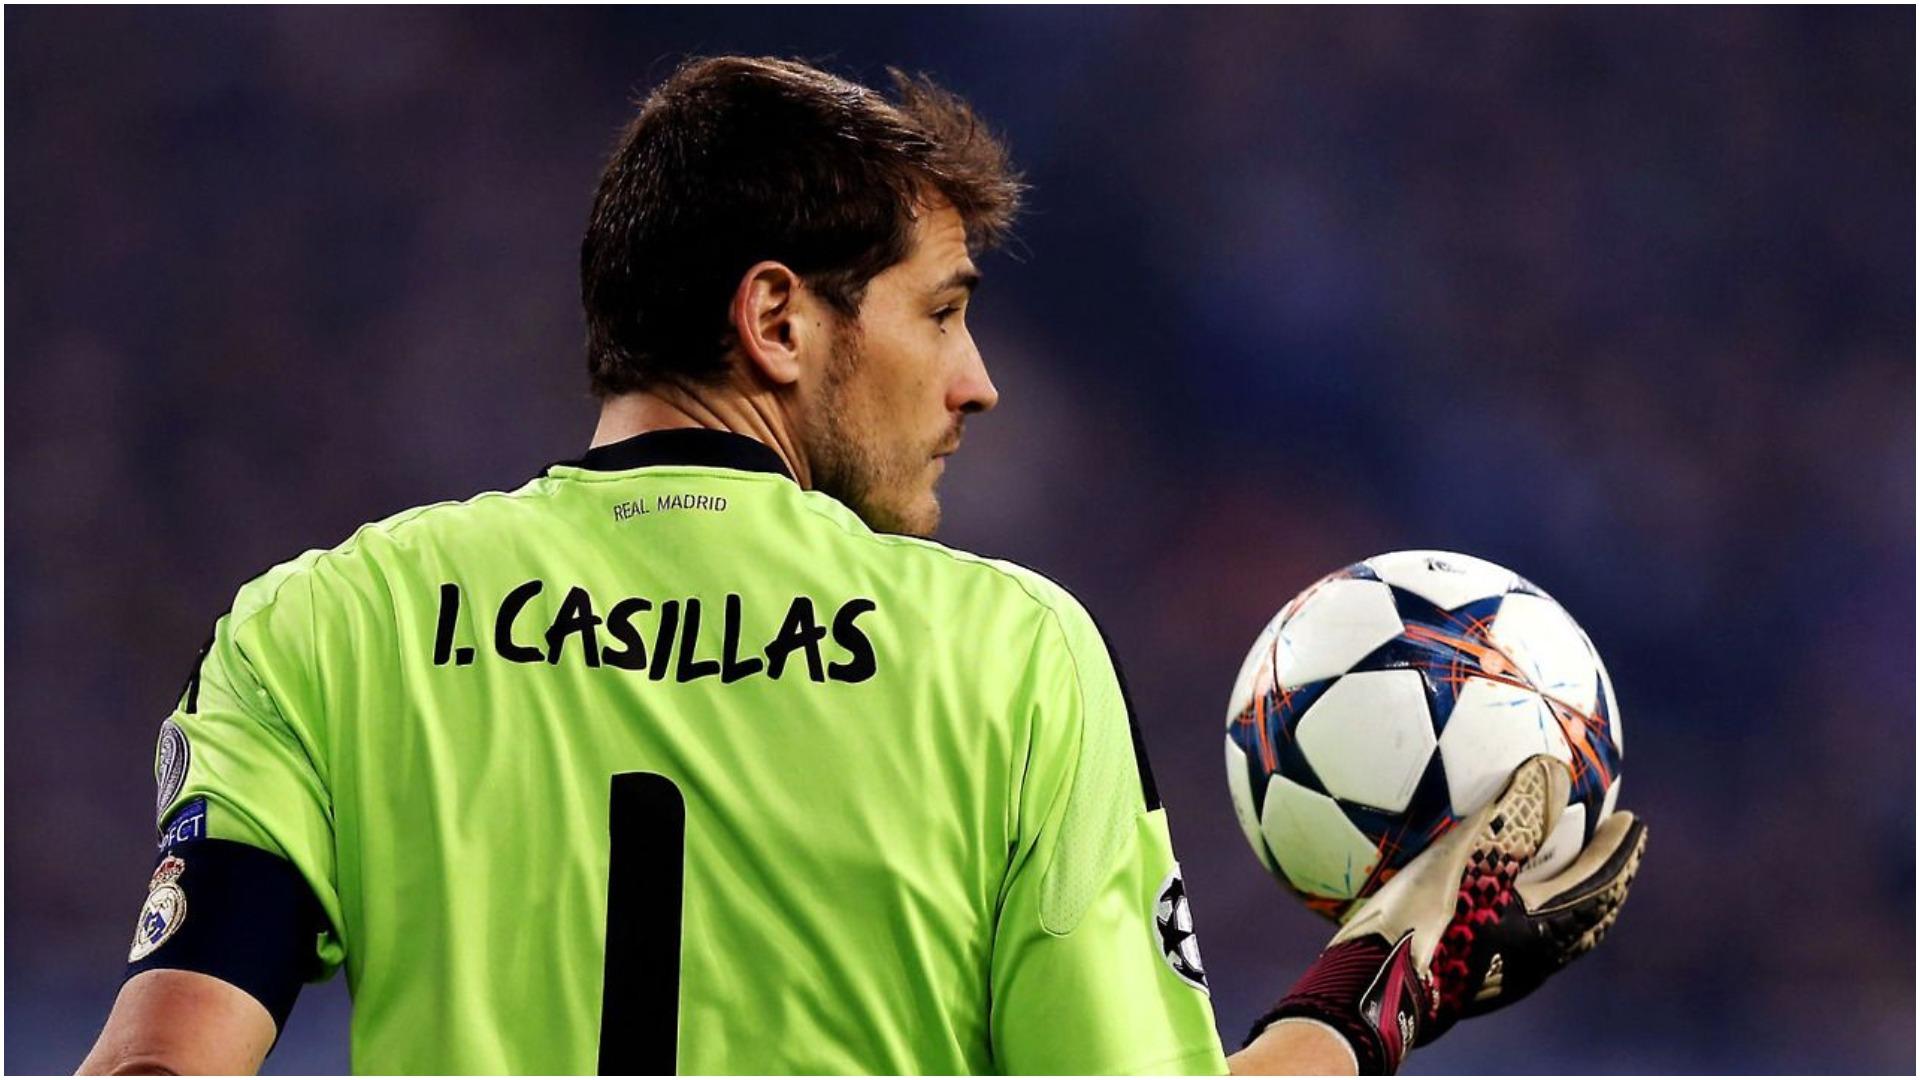 Luis Rubiales pa rival,  Iker Casillas habit me vendimin e fundit